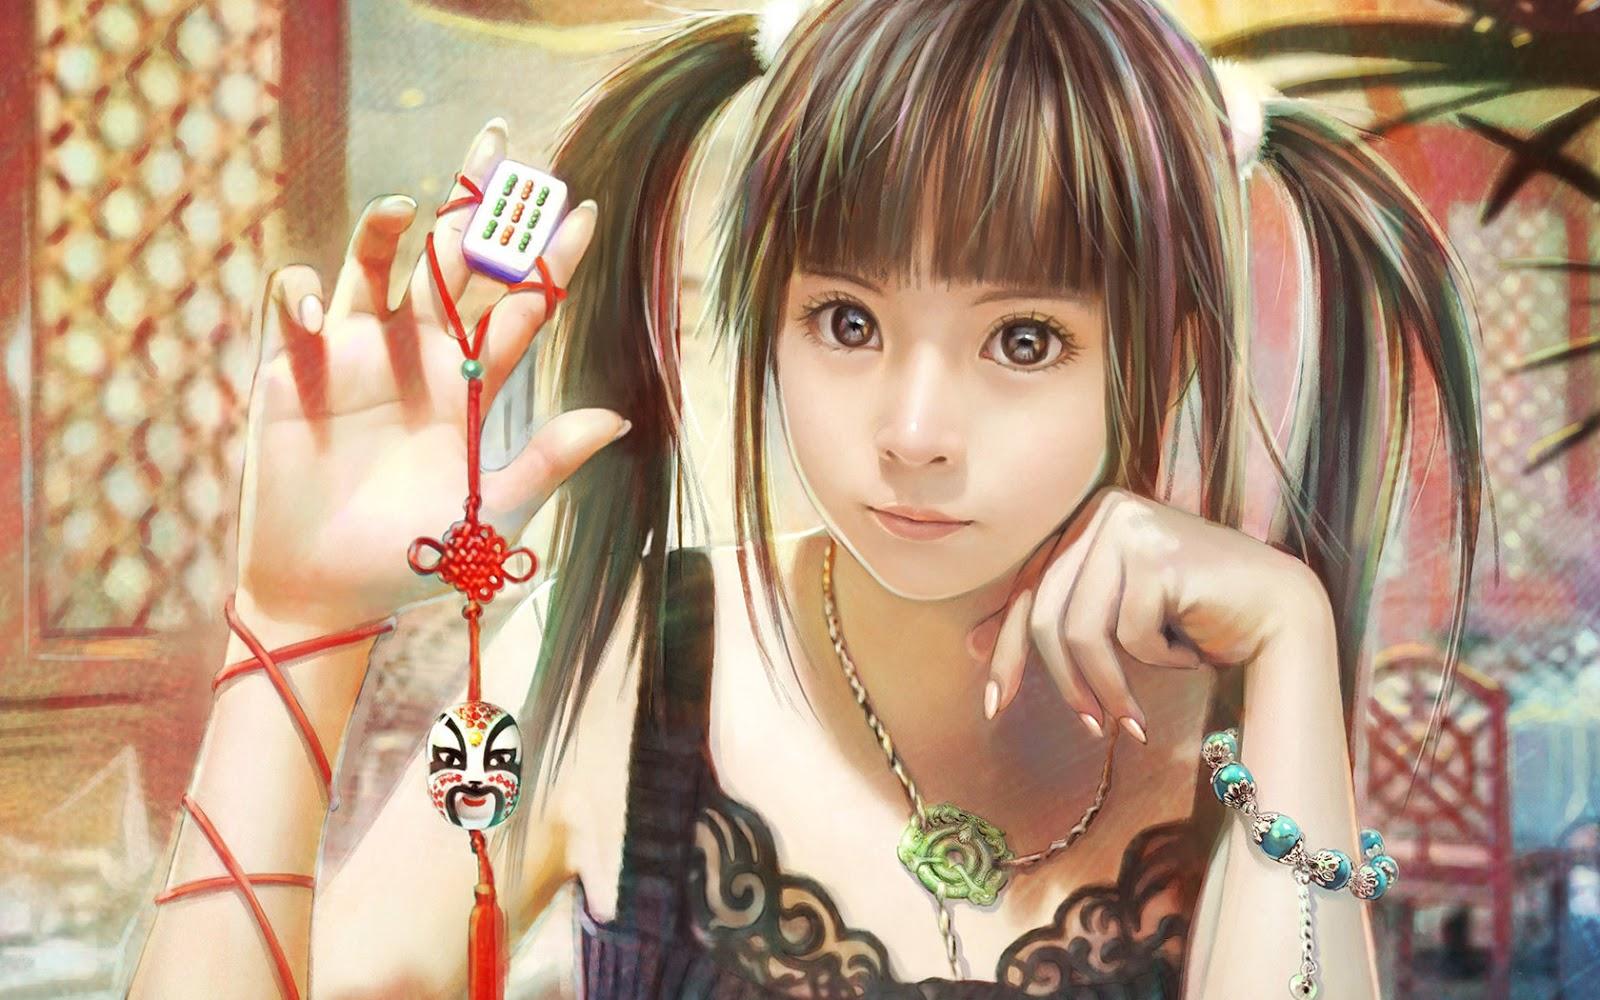 20 beautiful fantasy cg girls hd wallpapers npicx we share - Cg background hd ...